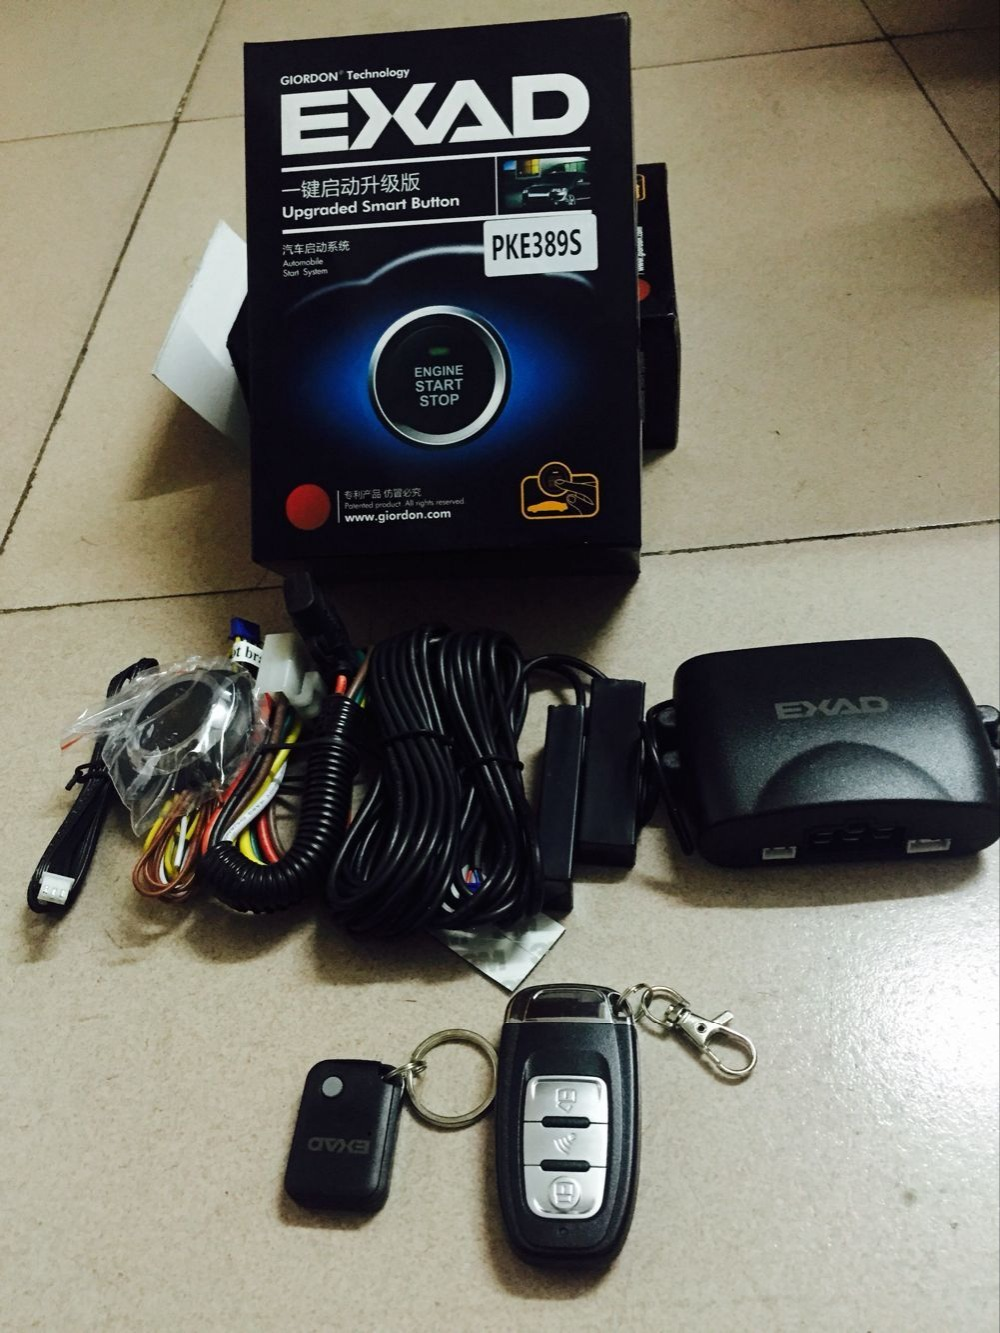 Hot Pke Car Alarm System Auto Keyless Entry Remote Start Smart Sensing 2 Remote Control Central Lock Button Engine Start Stop Aliexpress Com Imall Com